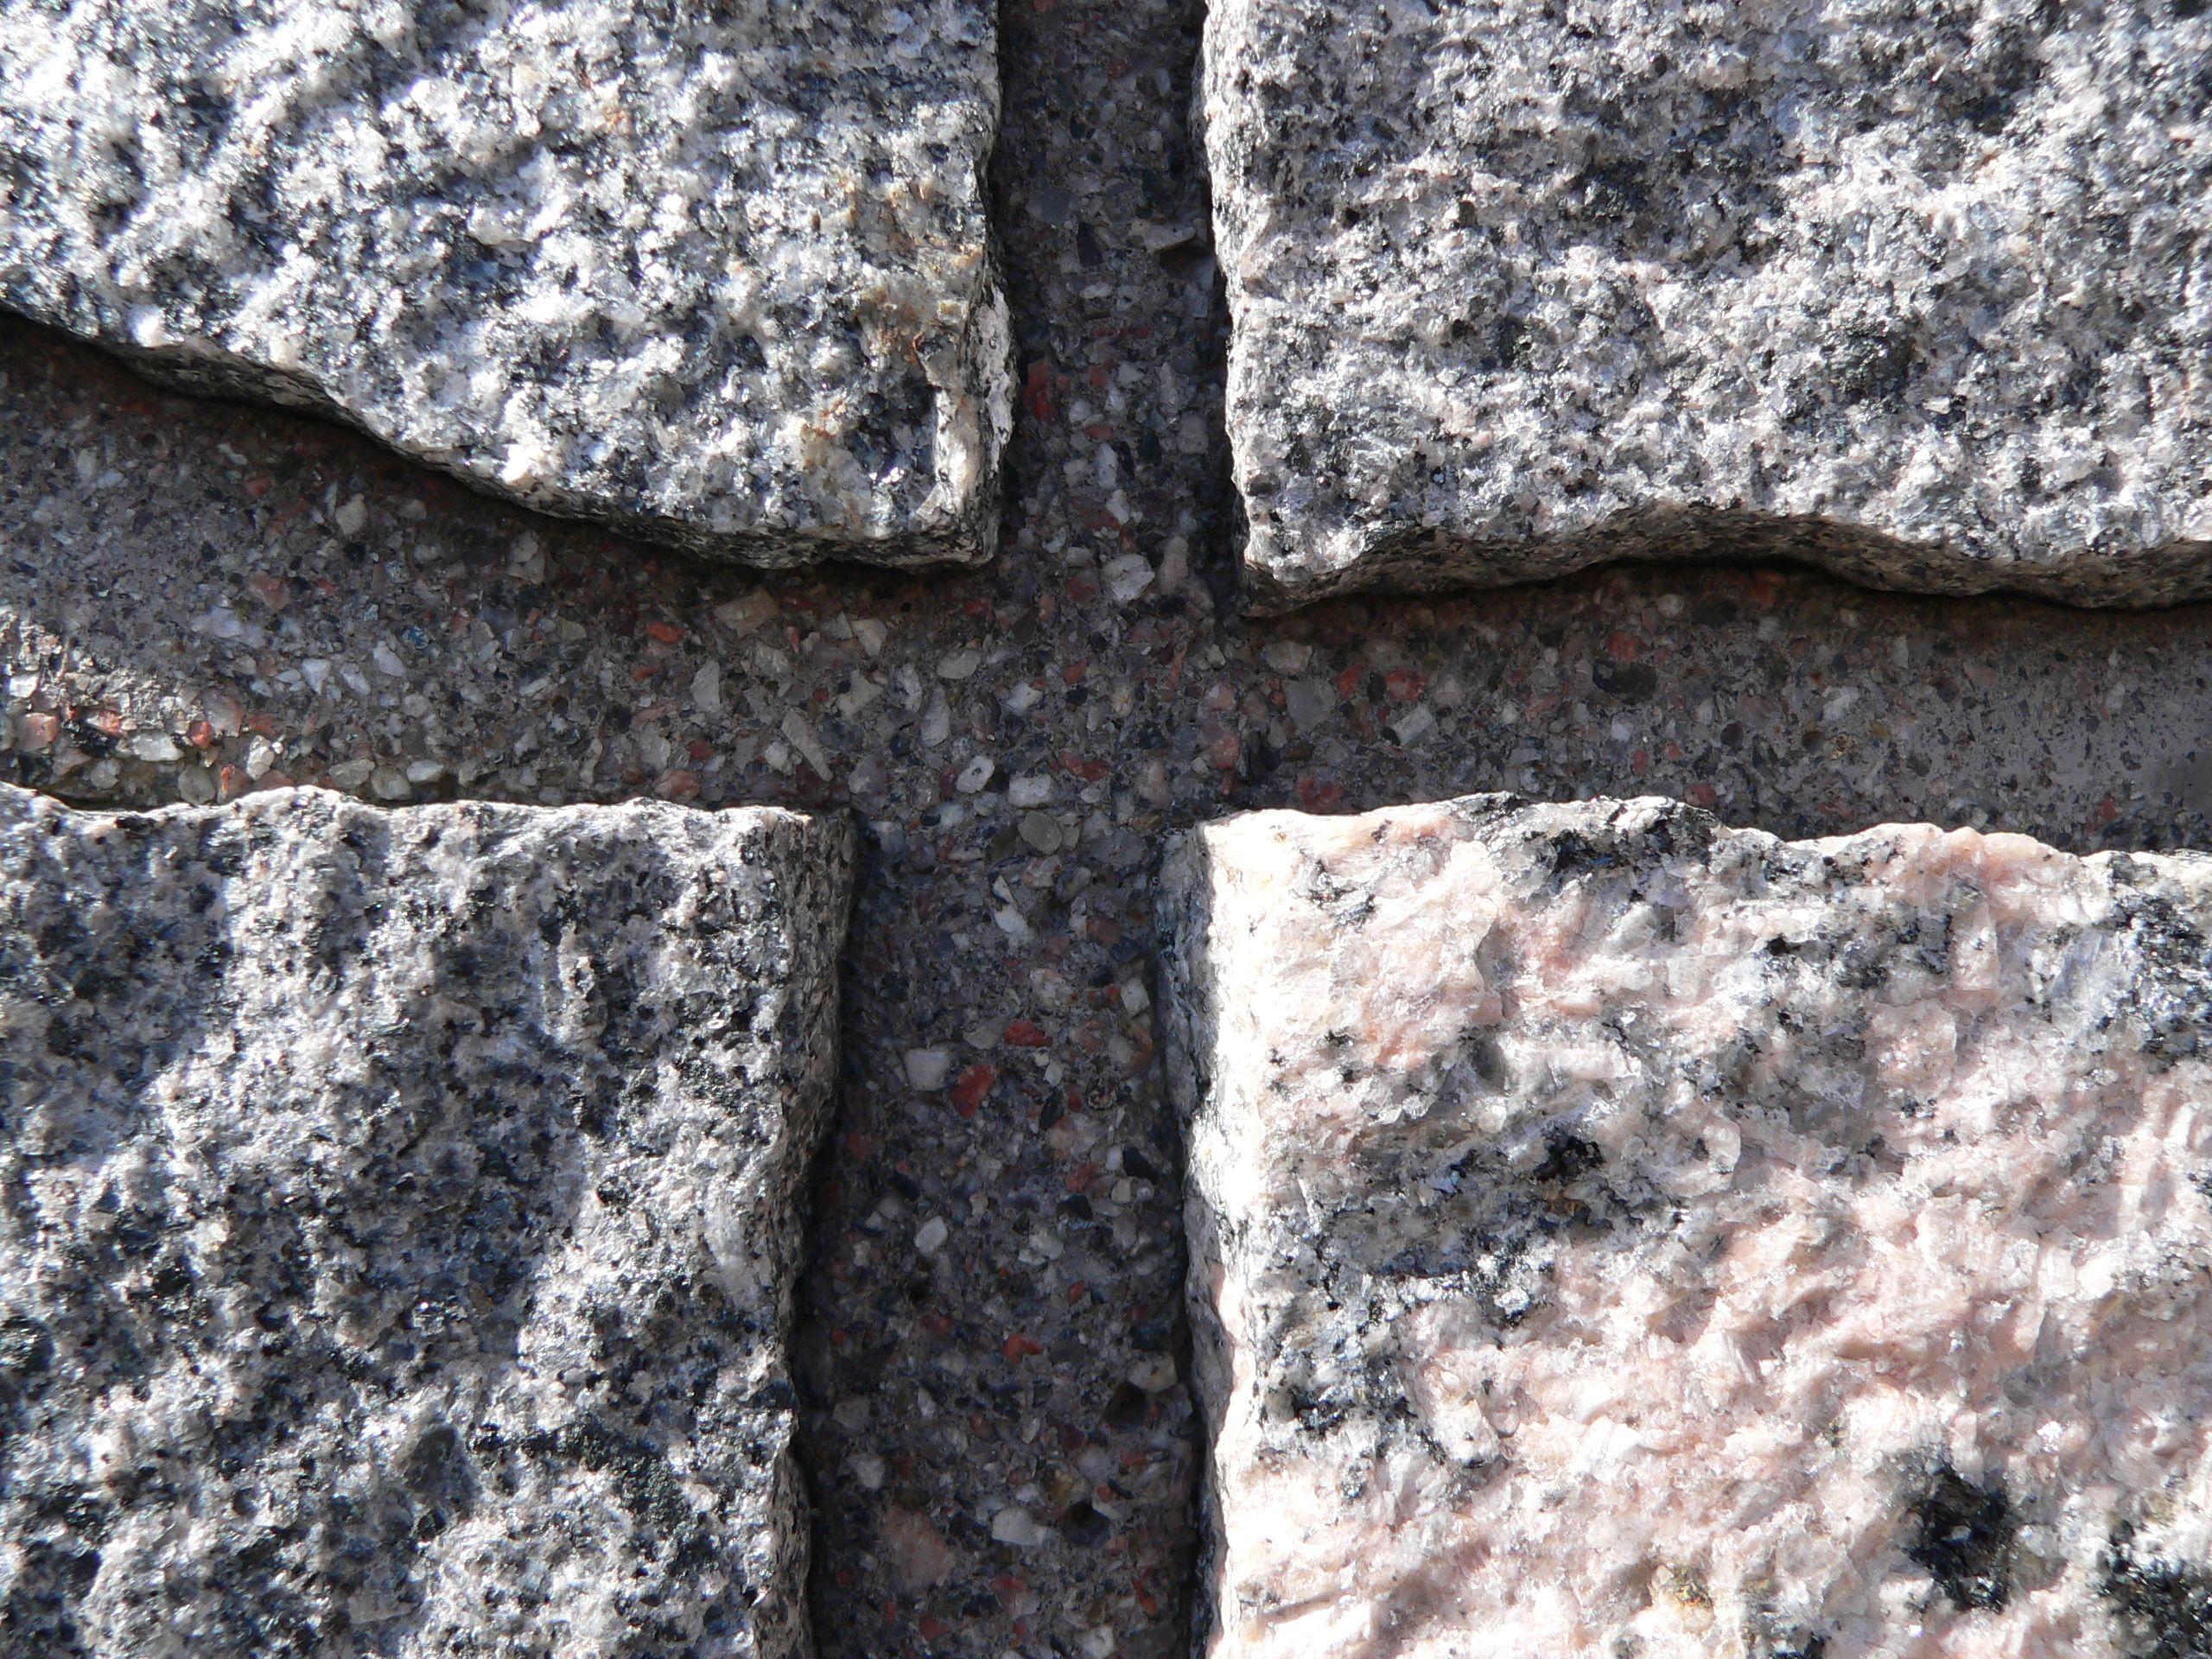 The Cross-bearer | Blogs by Christian Women